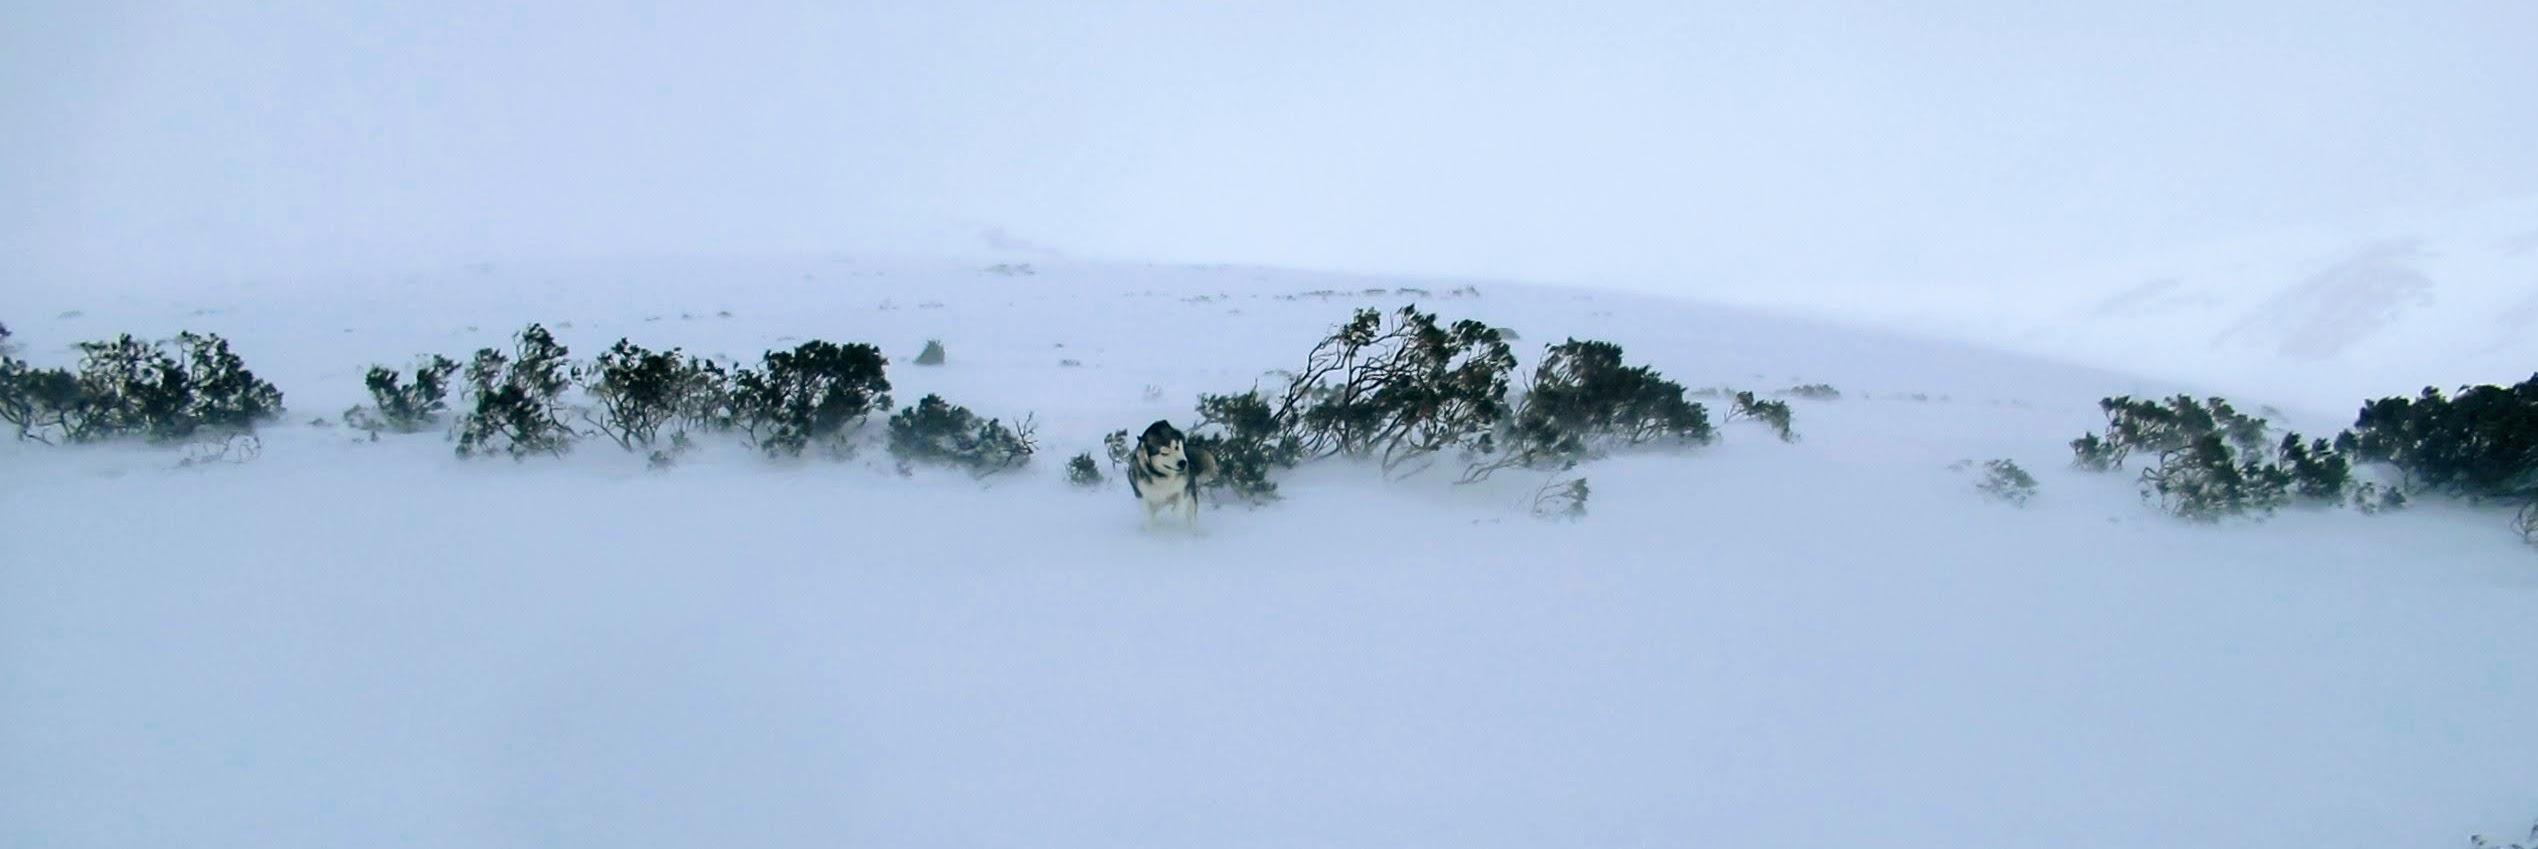 Sierra del Cordel, Brañavieja. Ventisca y bajo cero.